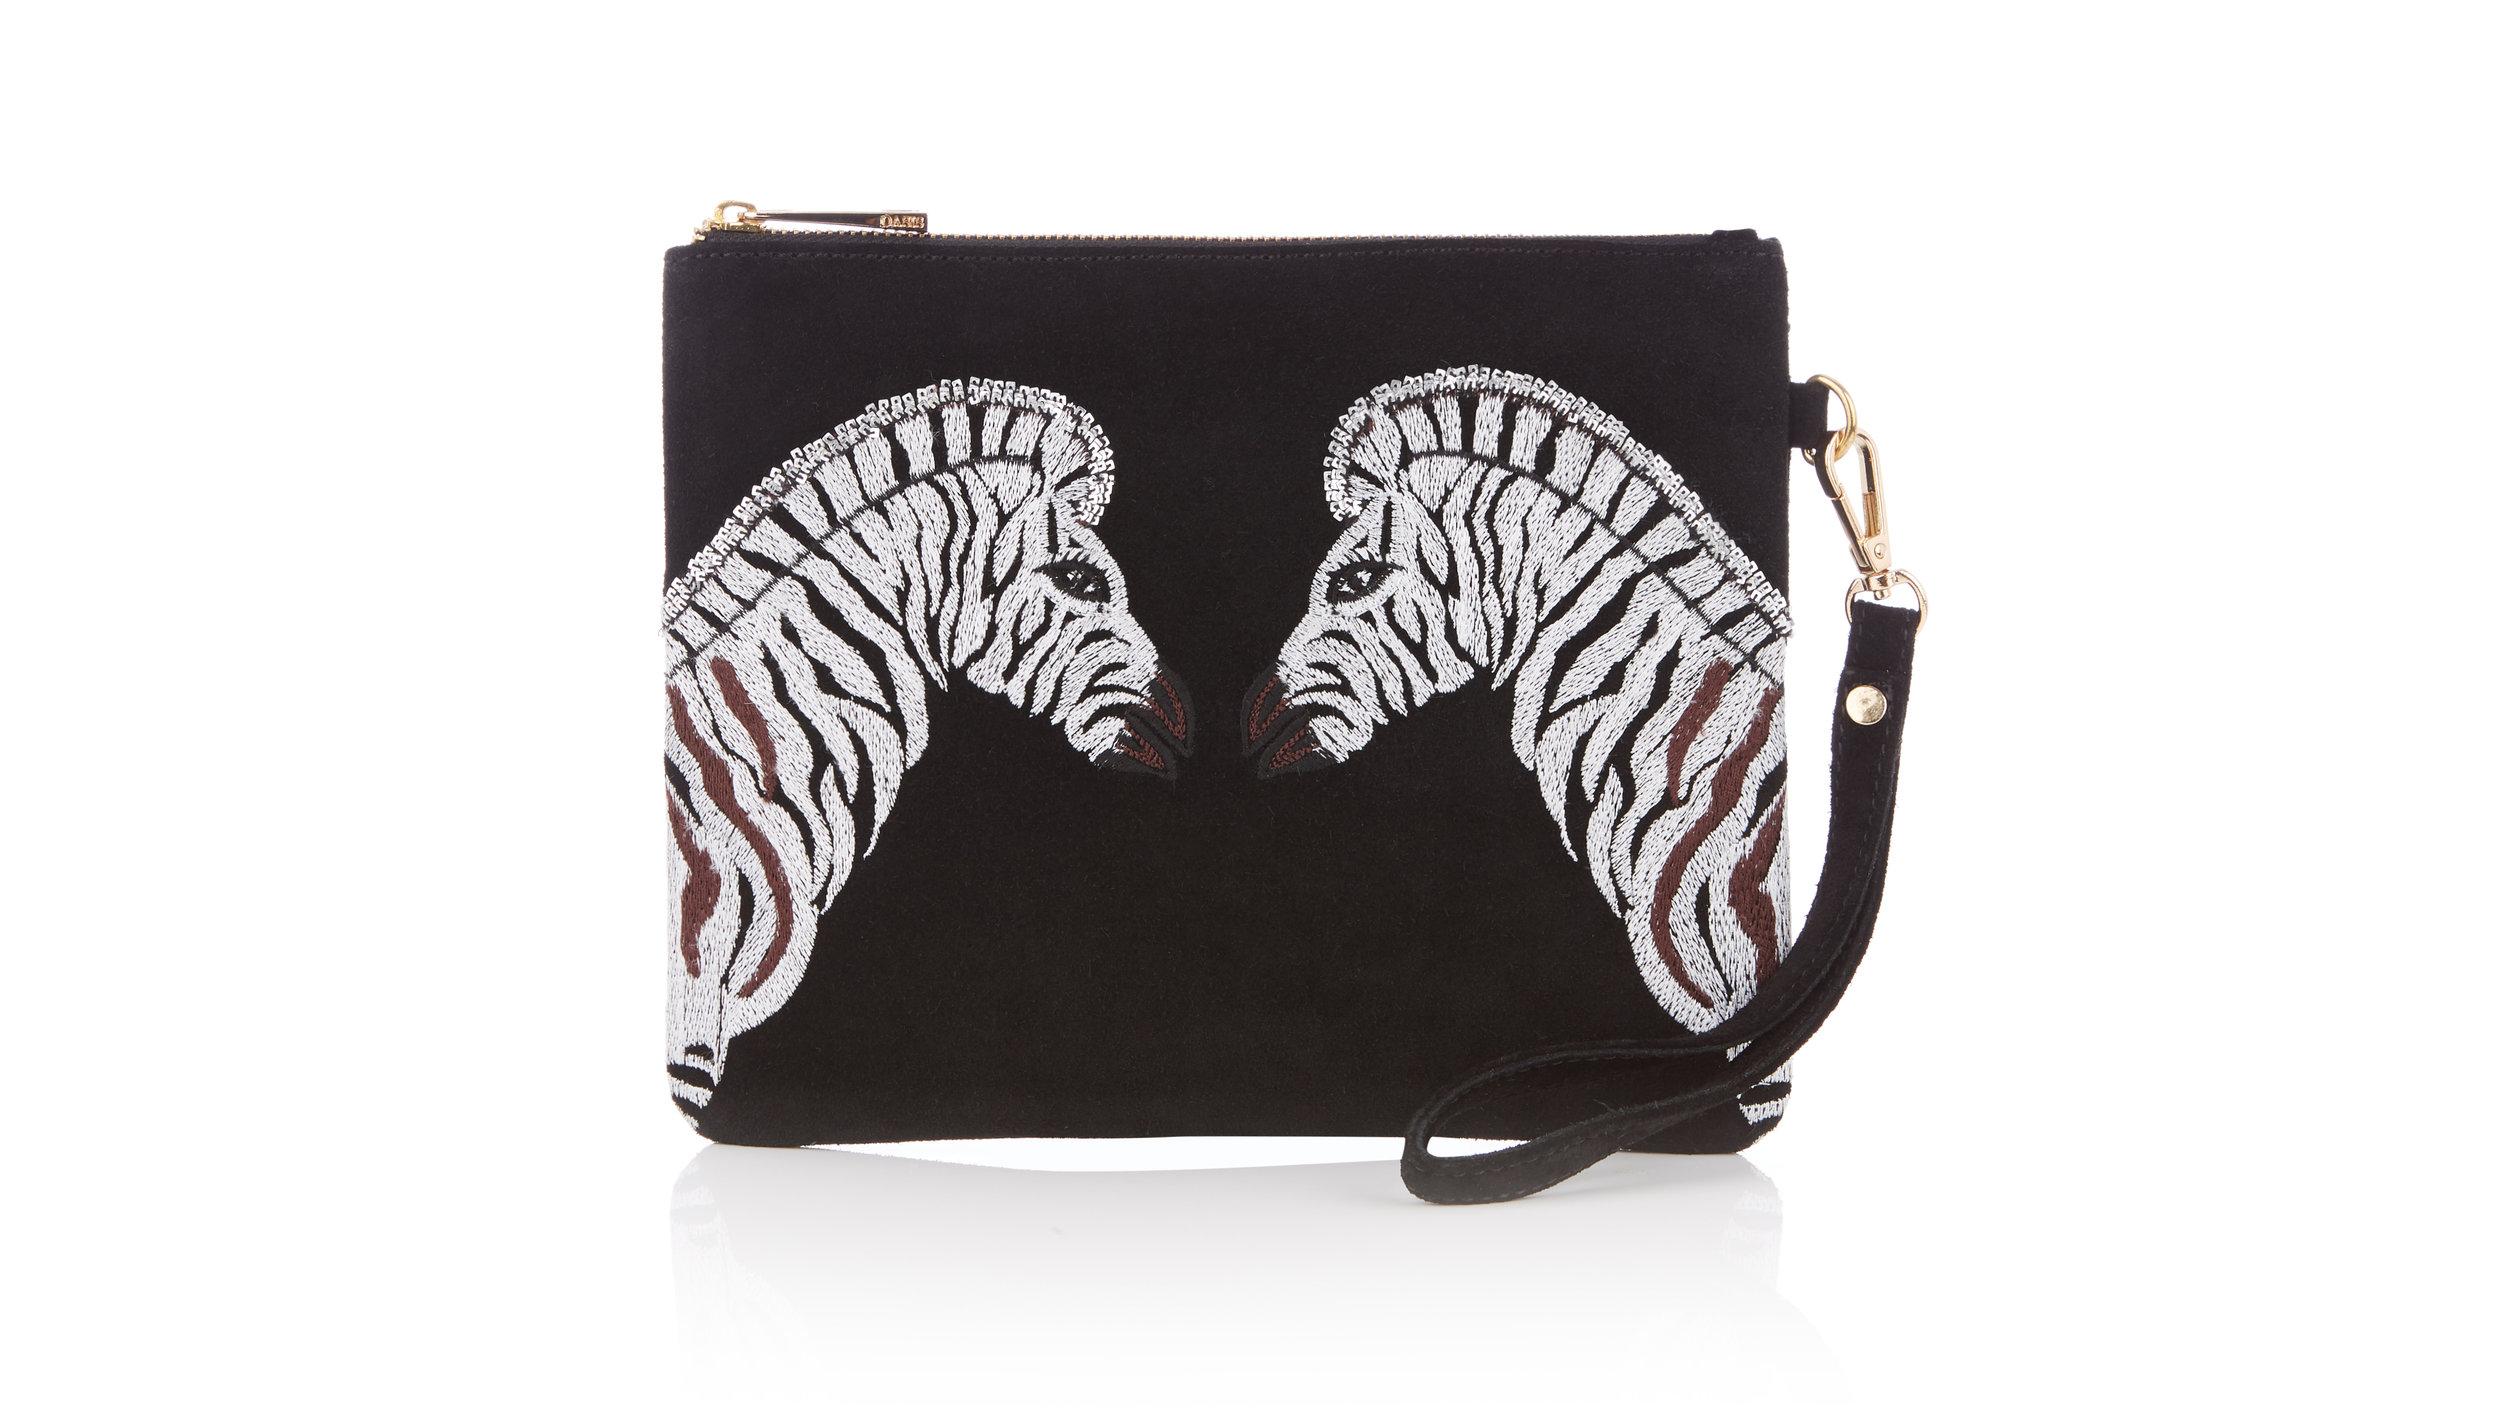 zebra-clutch-bag-black-oasis-london-zoo-zsl-animal